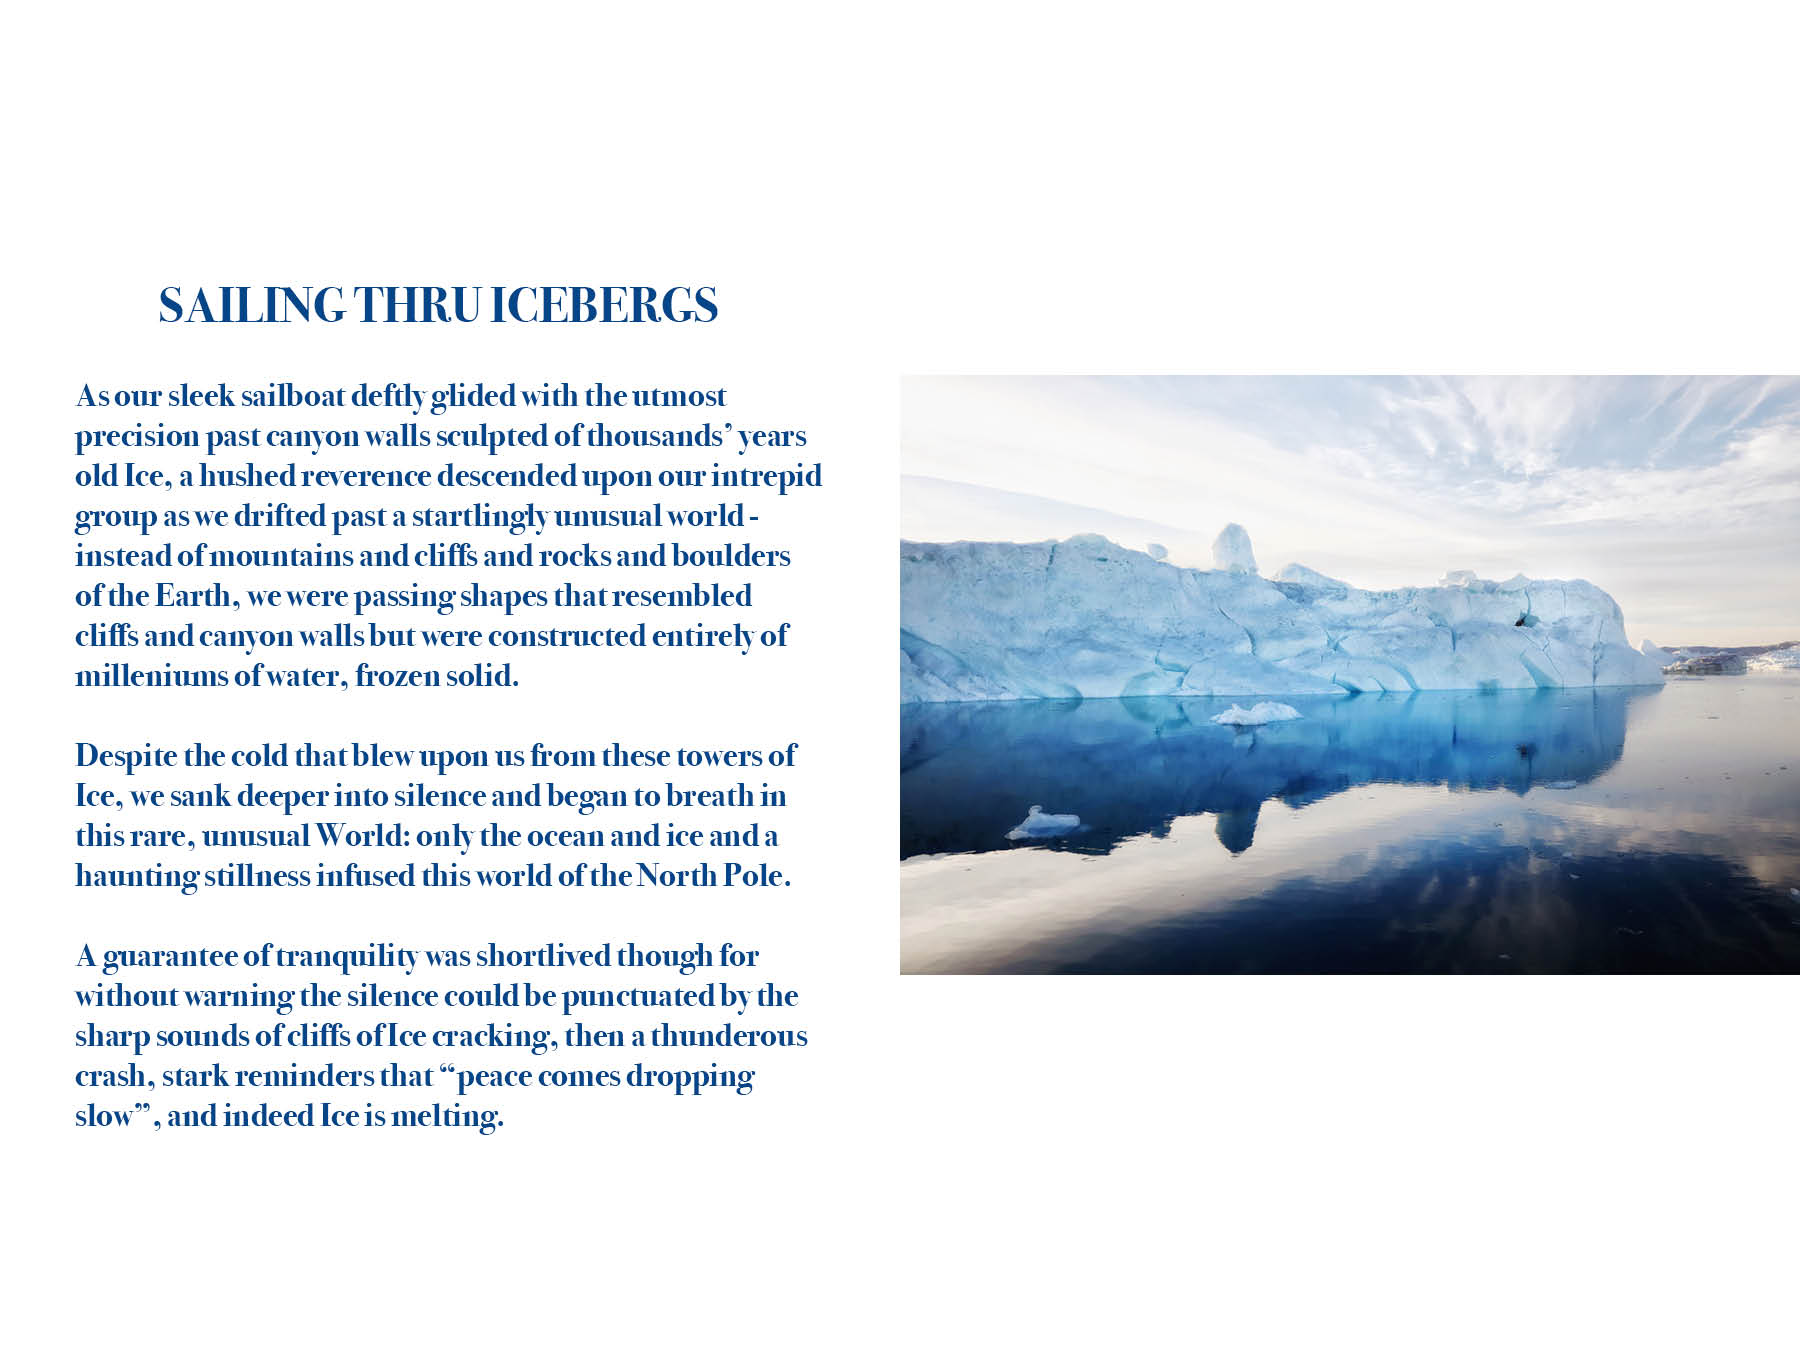 Sailing_Thru_Icebergs_article_3.jpg